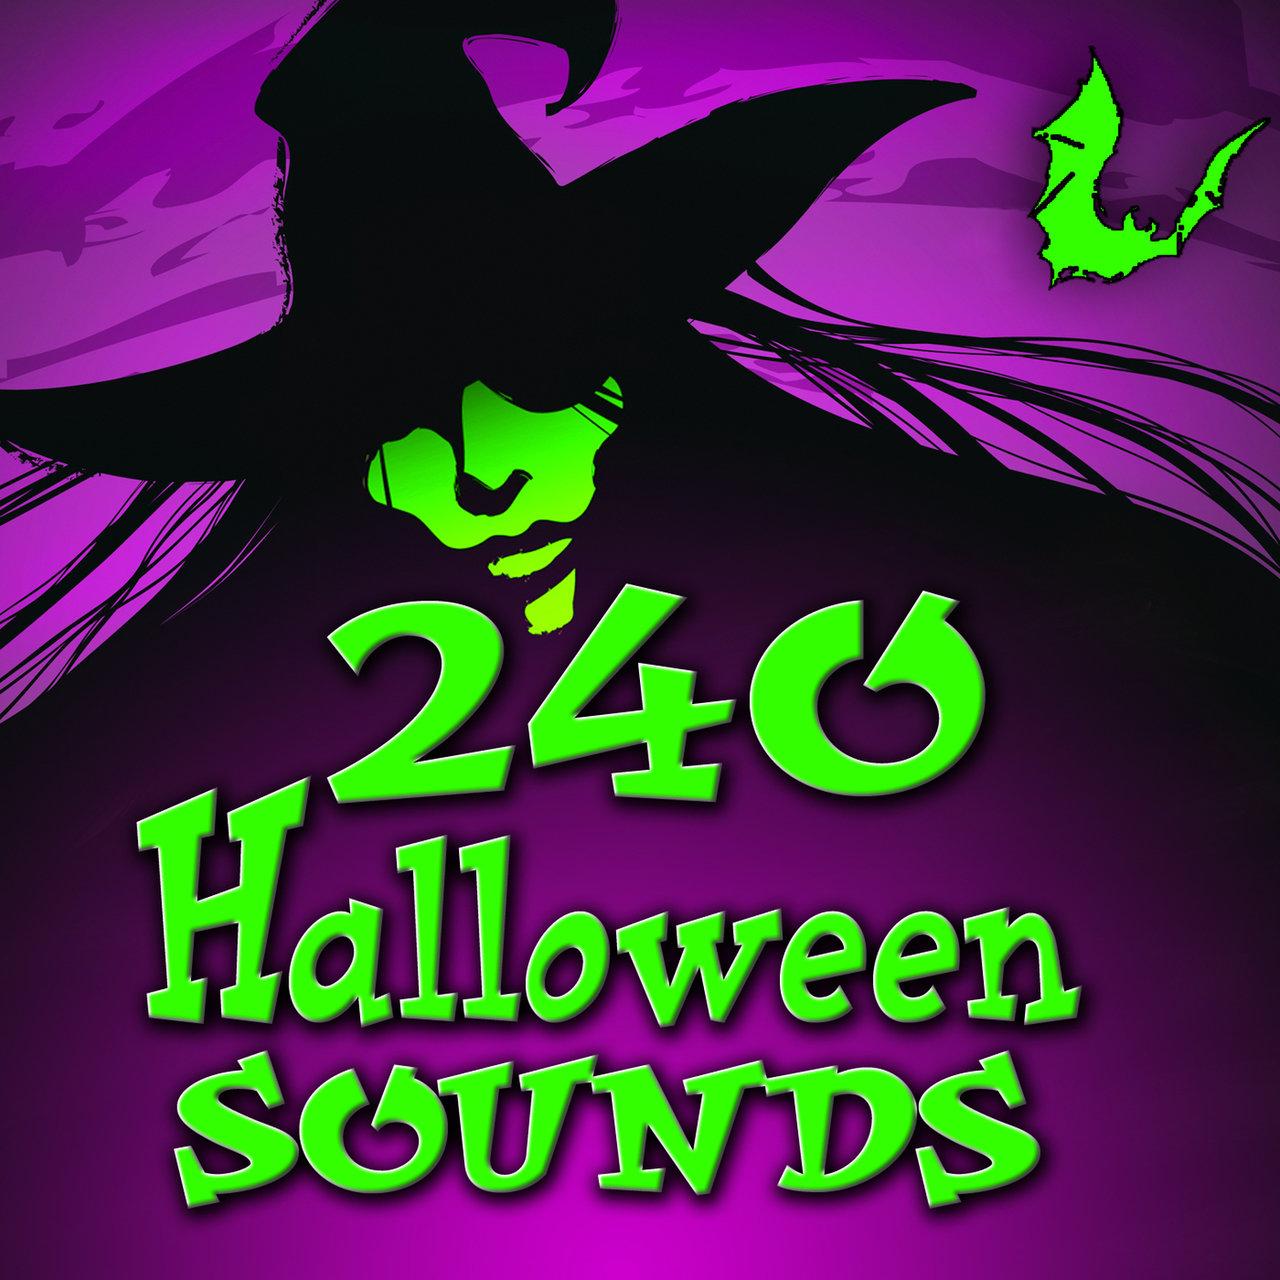 TIDAL: Listen to Halloween Sounds on TIDAL